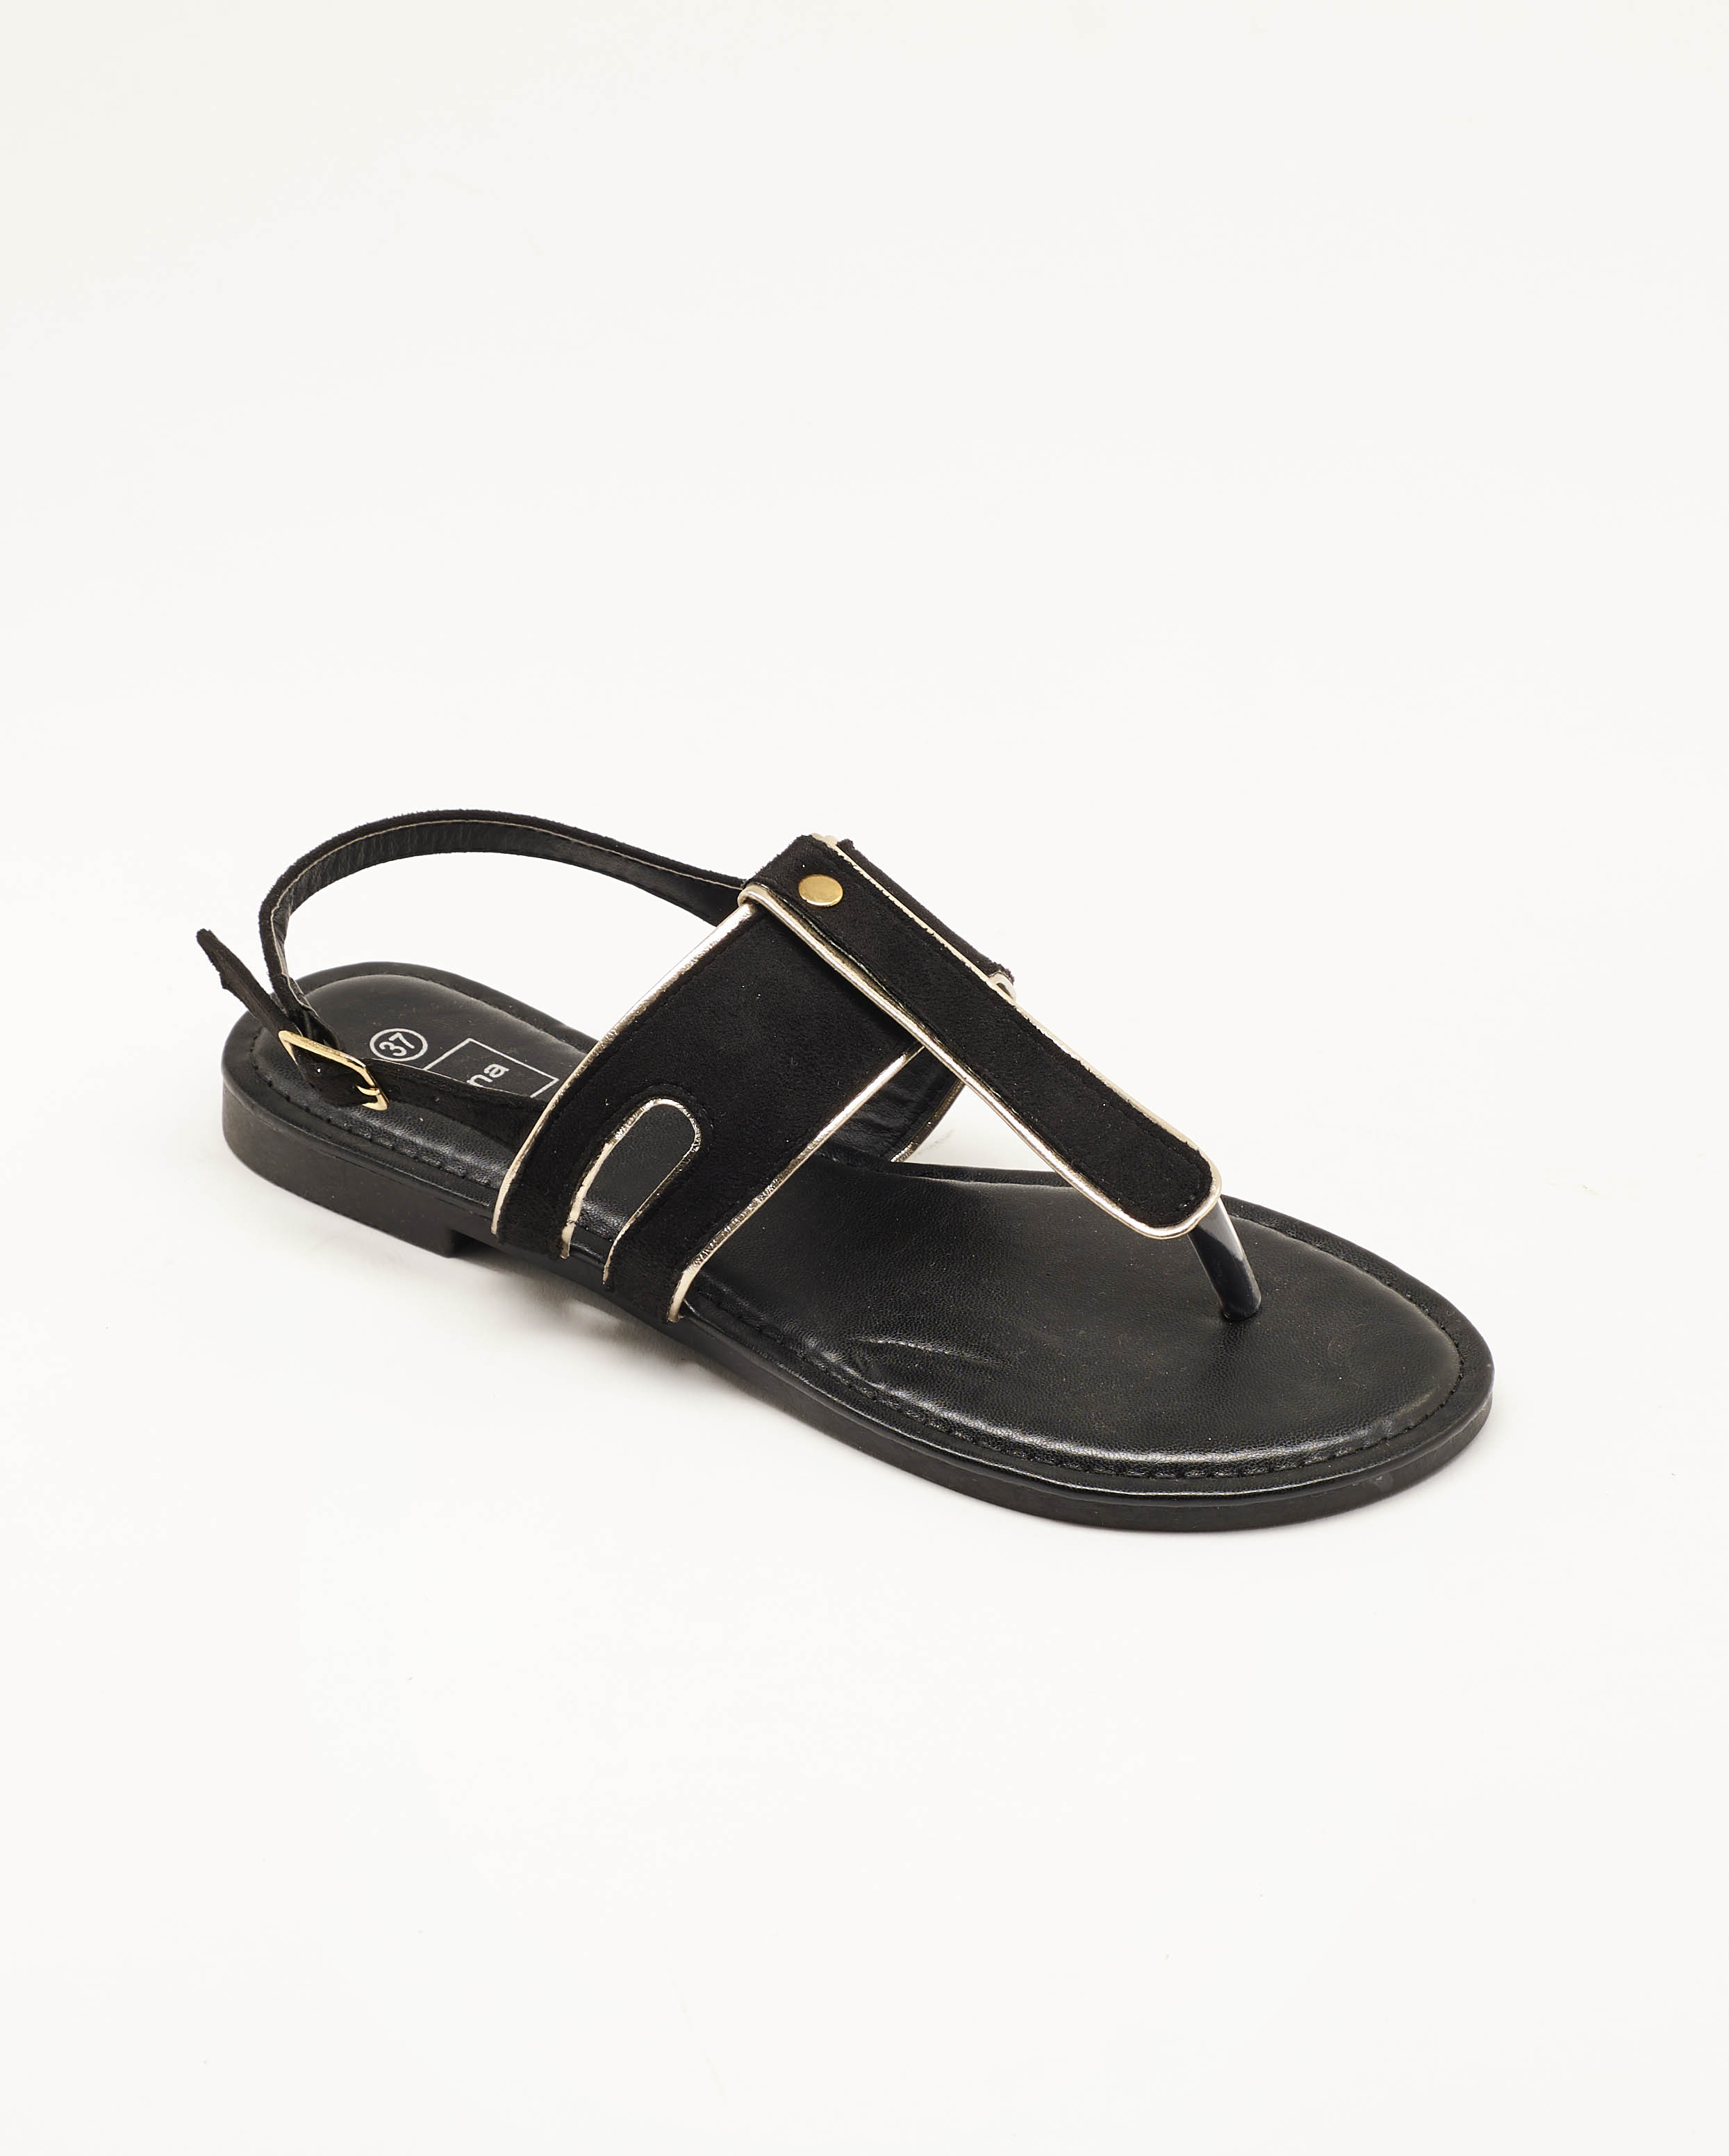 Sandales Plates Femme - Sandale Plate Noir Jina - Nady